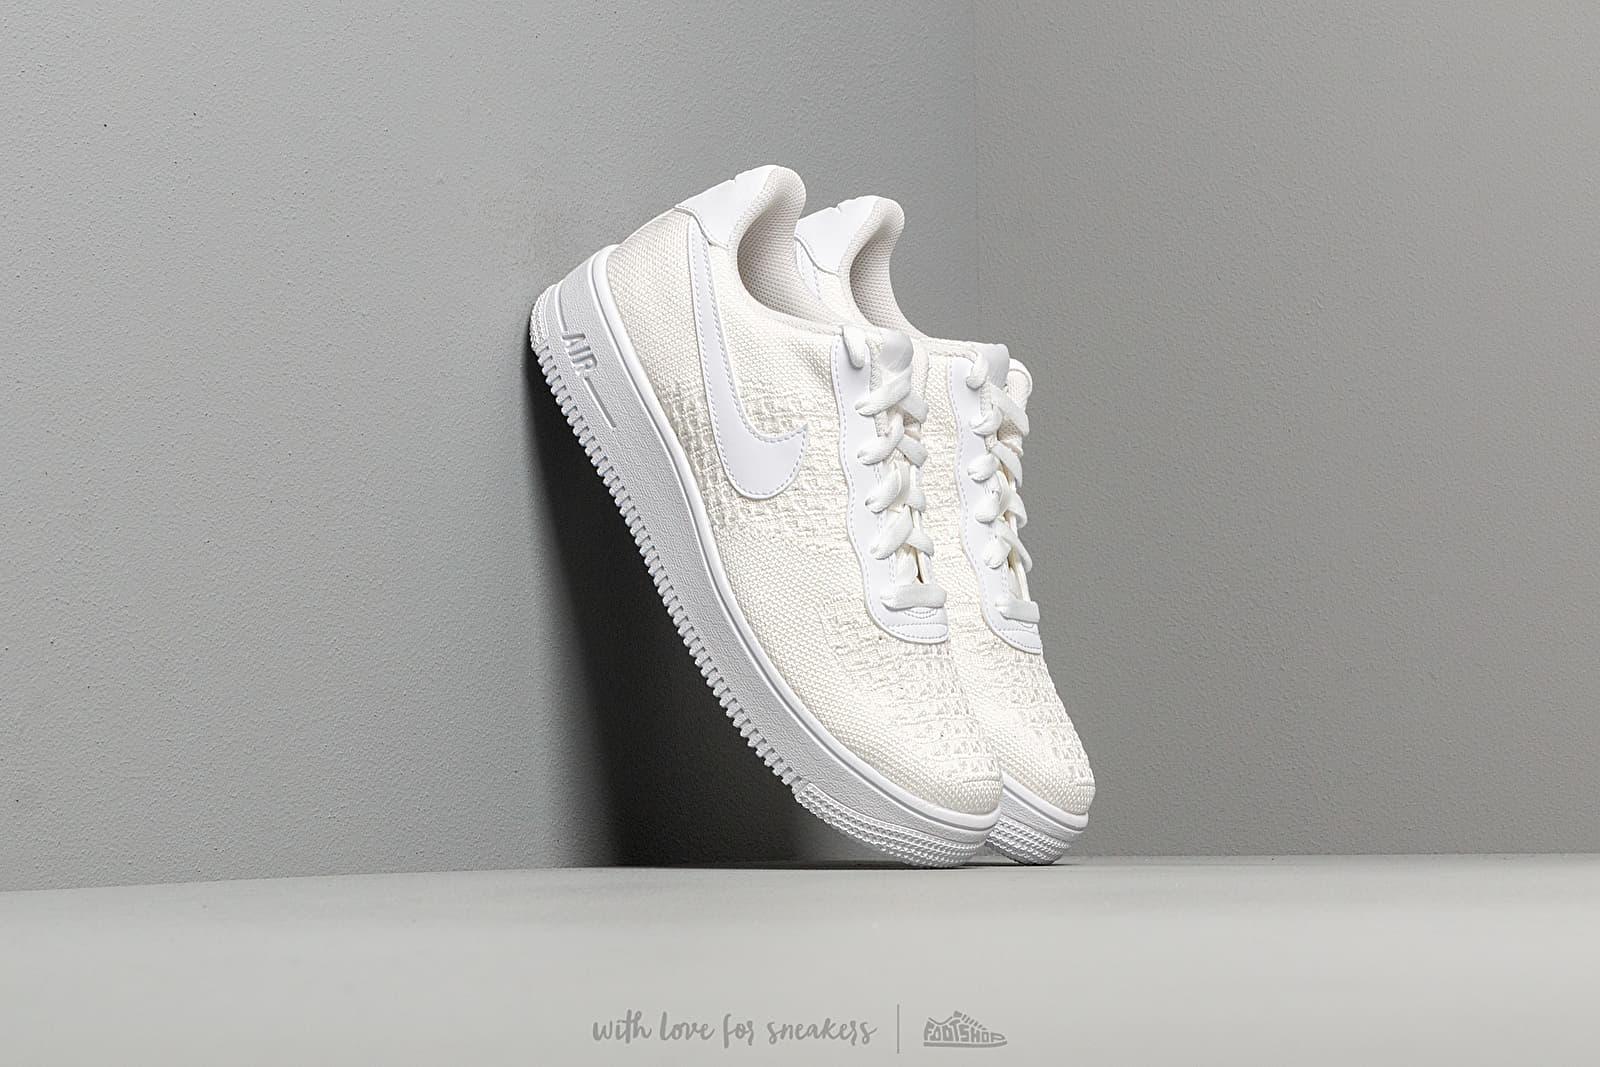 Nike Air Force 1 Flyknit 2.0 (GS) White/ White-White za skvelú cenu 84 € kúpite na Footshop.sk